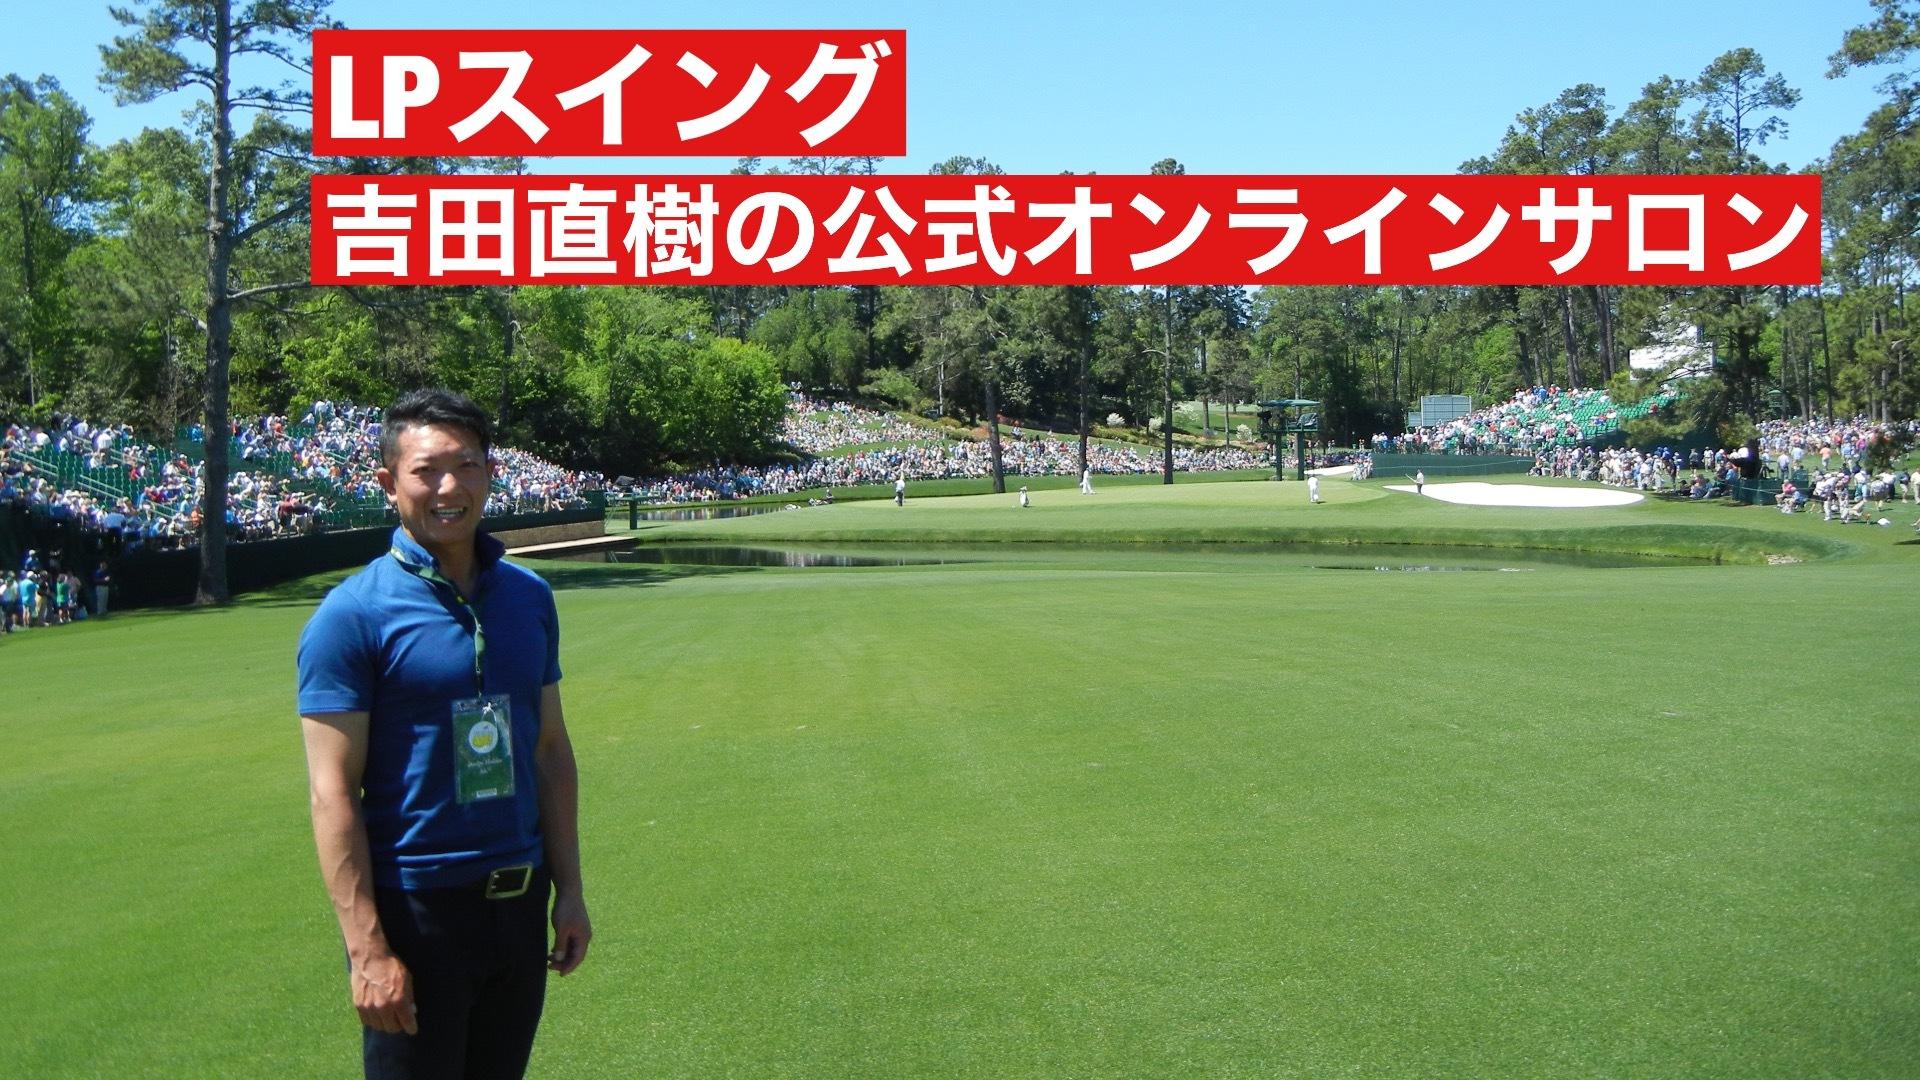 LPスイング 吉田直樹の公式オンラインサロン